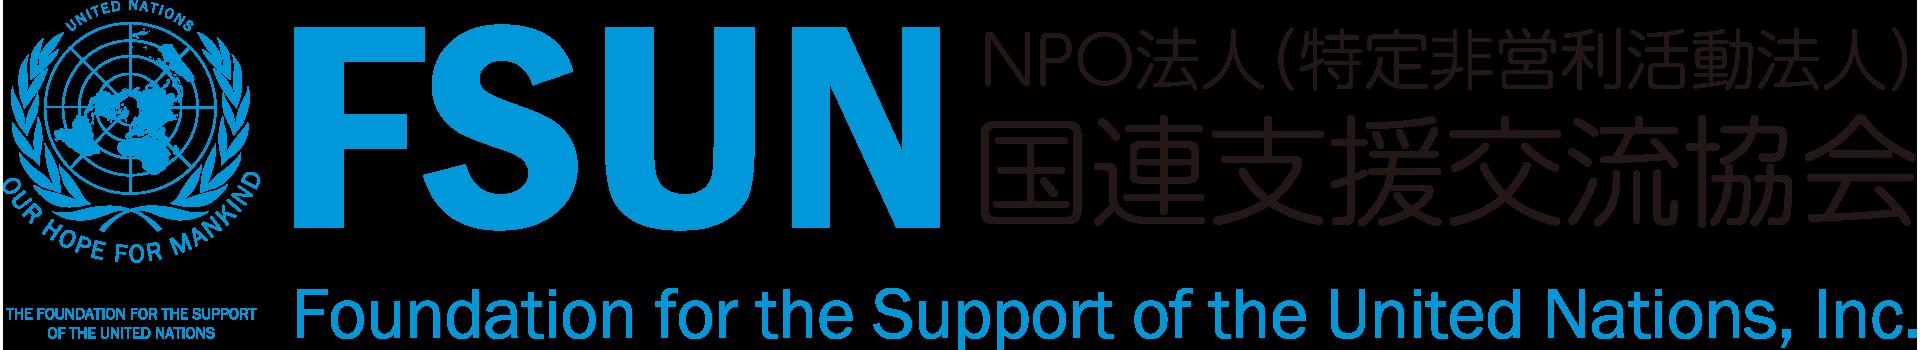 FSUN/特定非営利活動法人 国連支援交流協会(公式)ホームページ